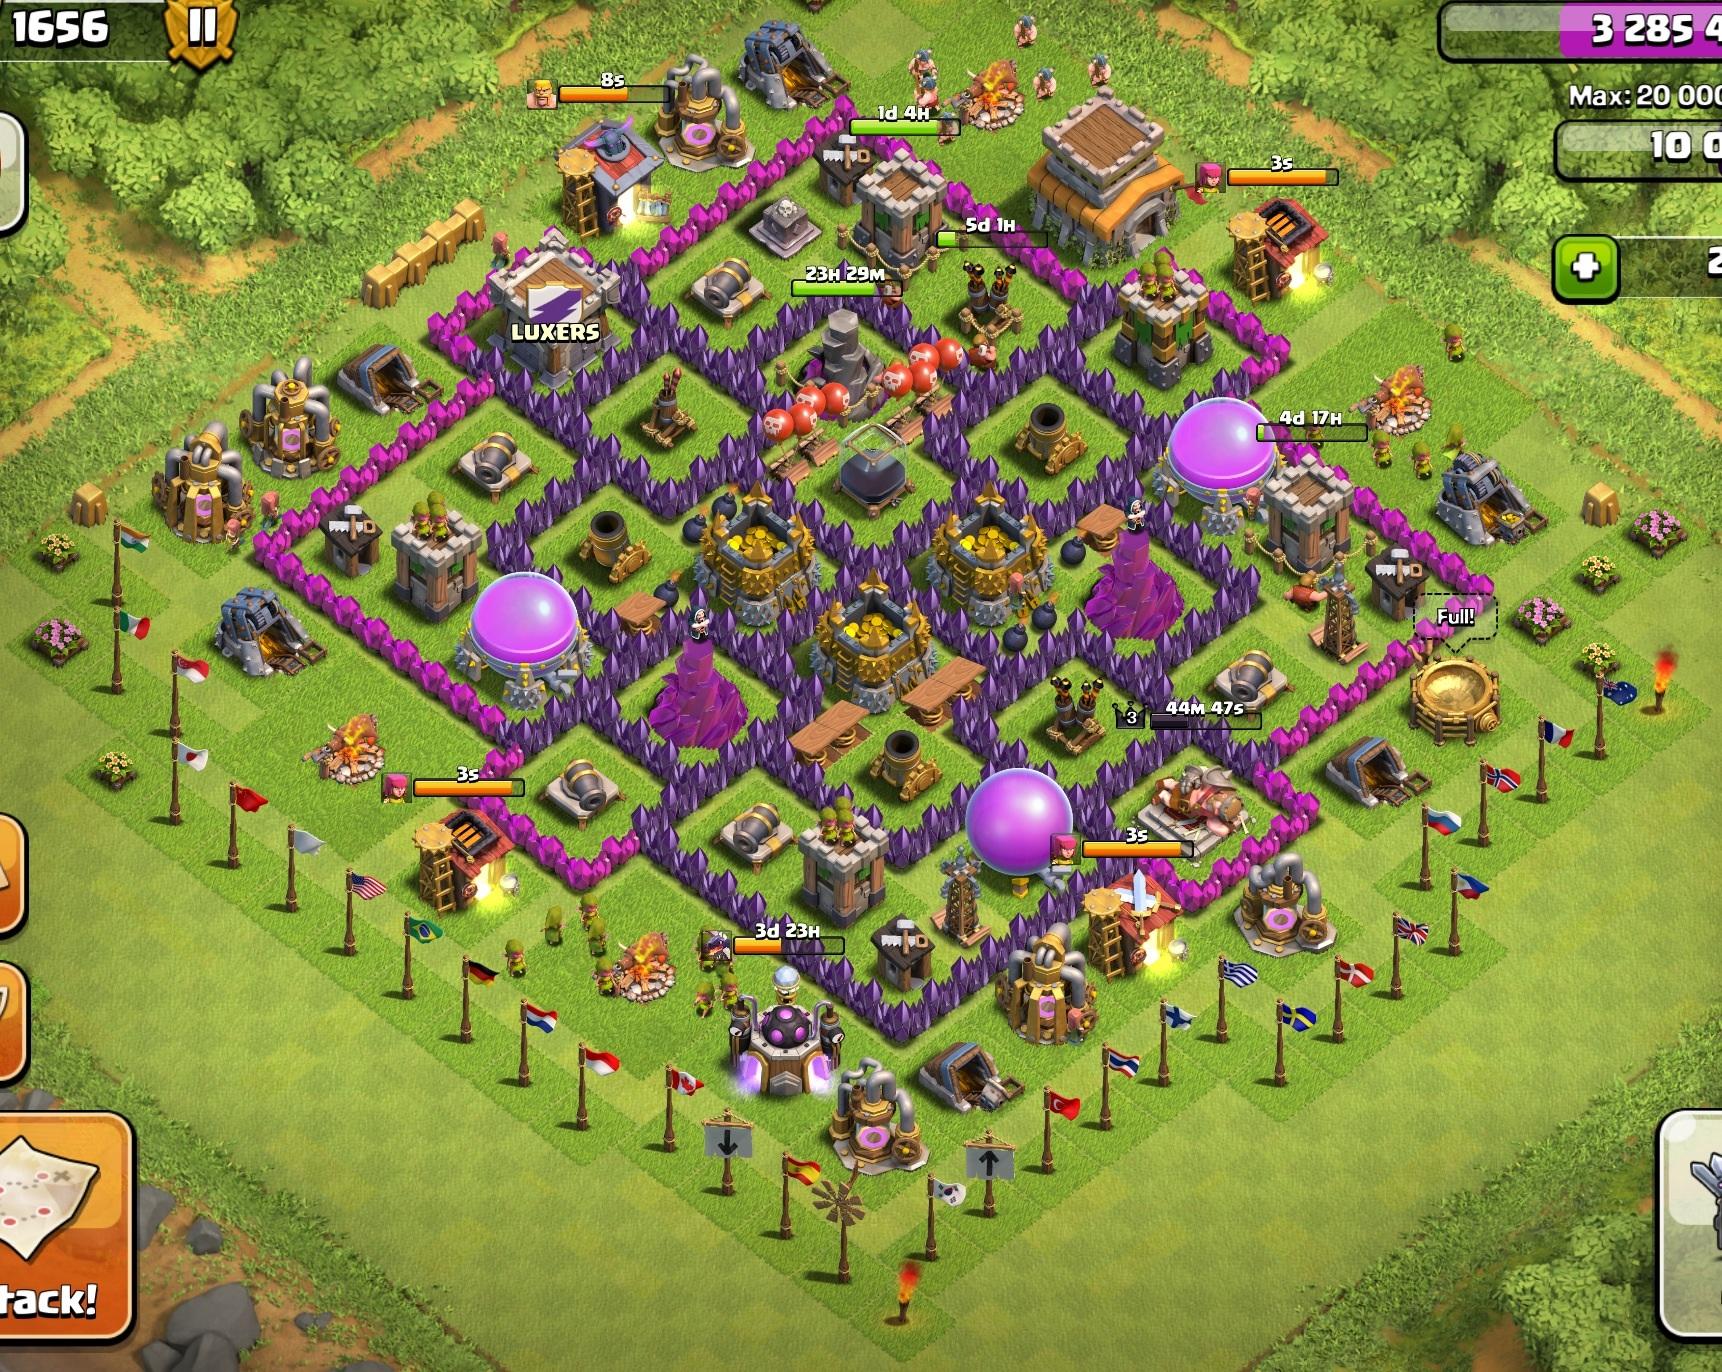 Dexalxa's Village Strategy Guide - Clash of Clans Wiki